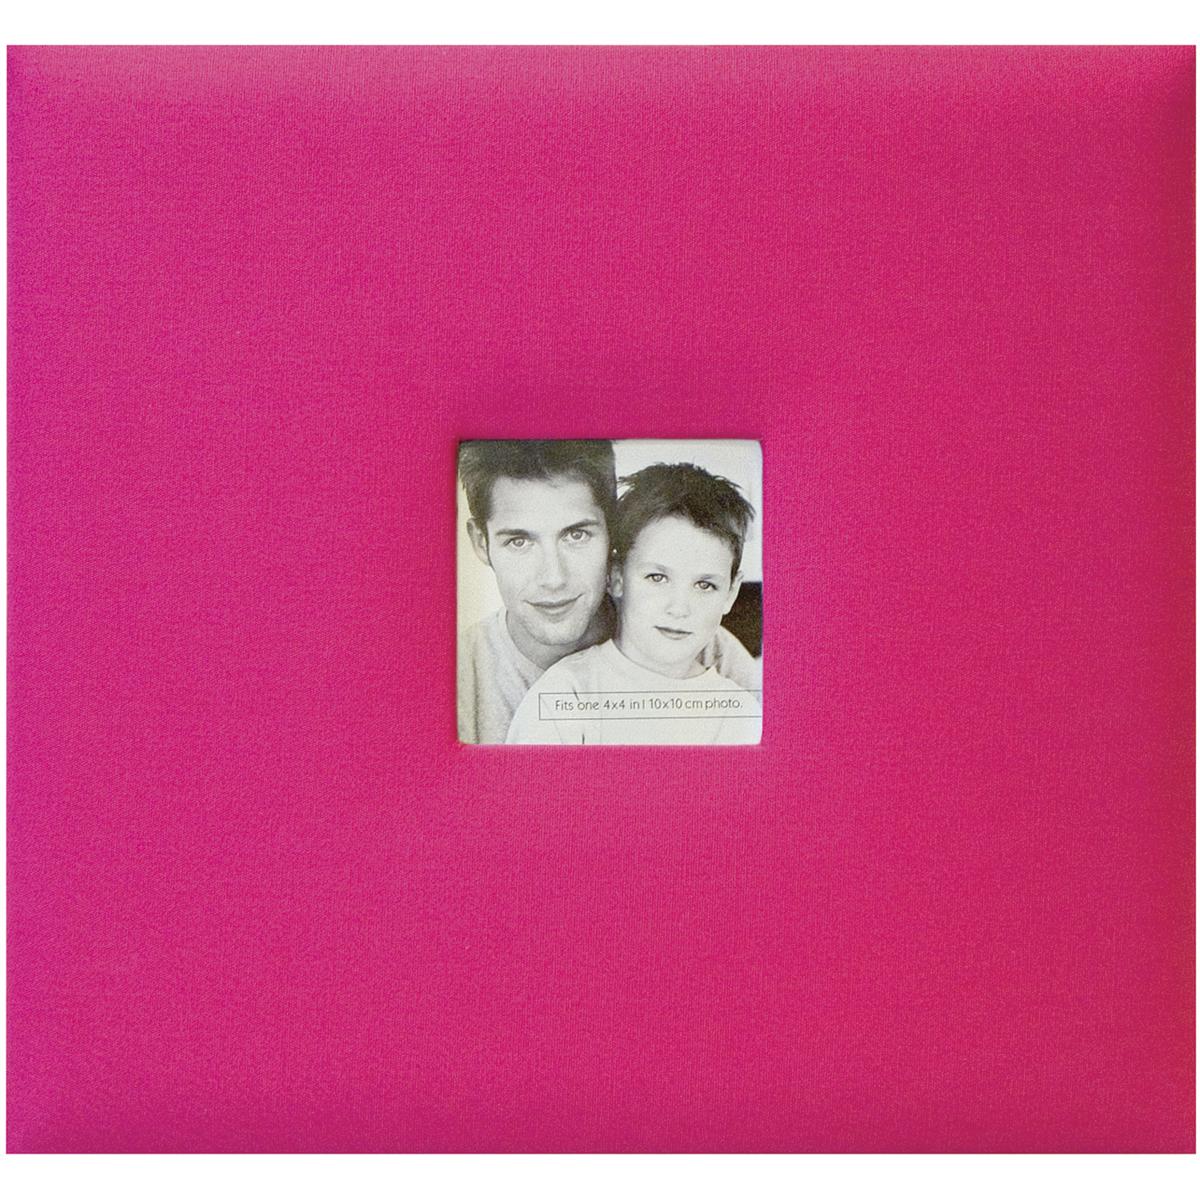 Hot Pink Fashion Fabric 8X8